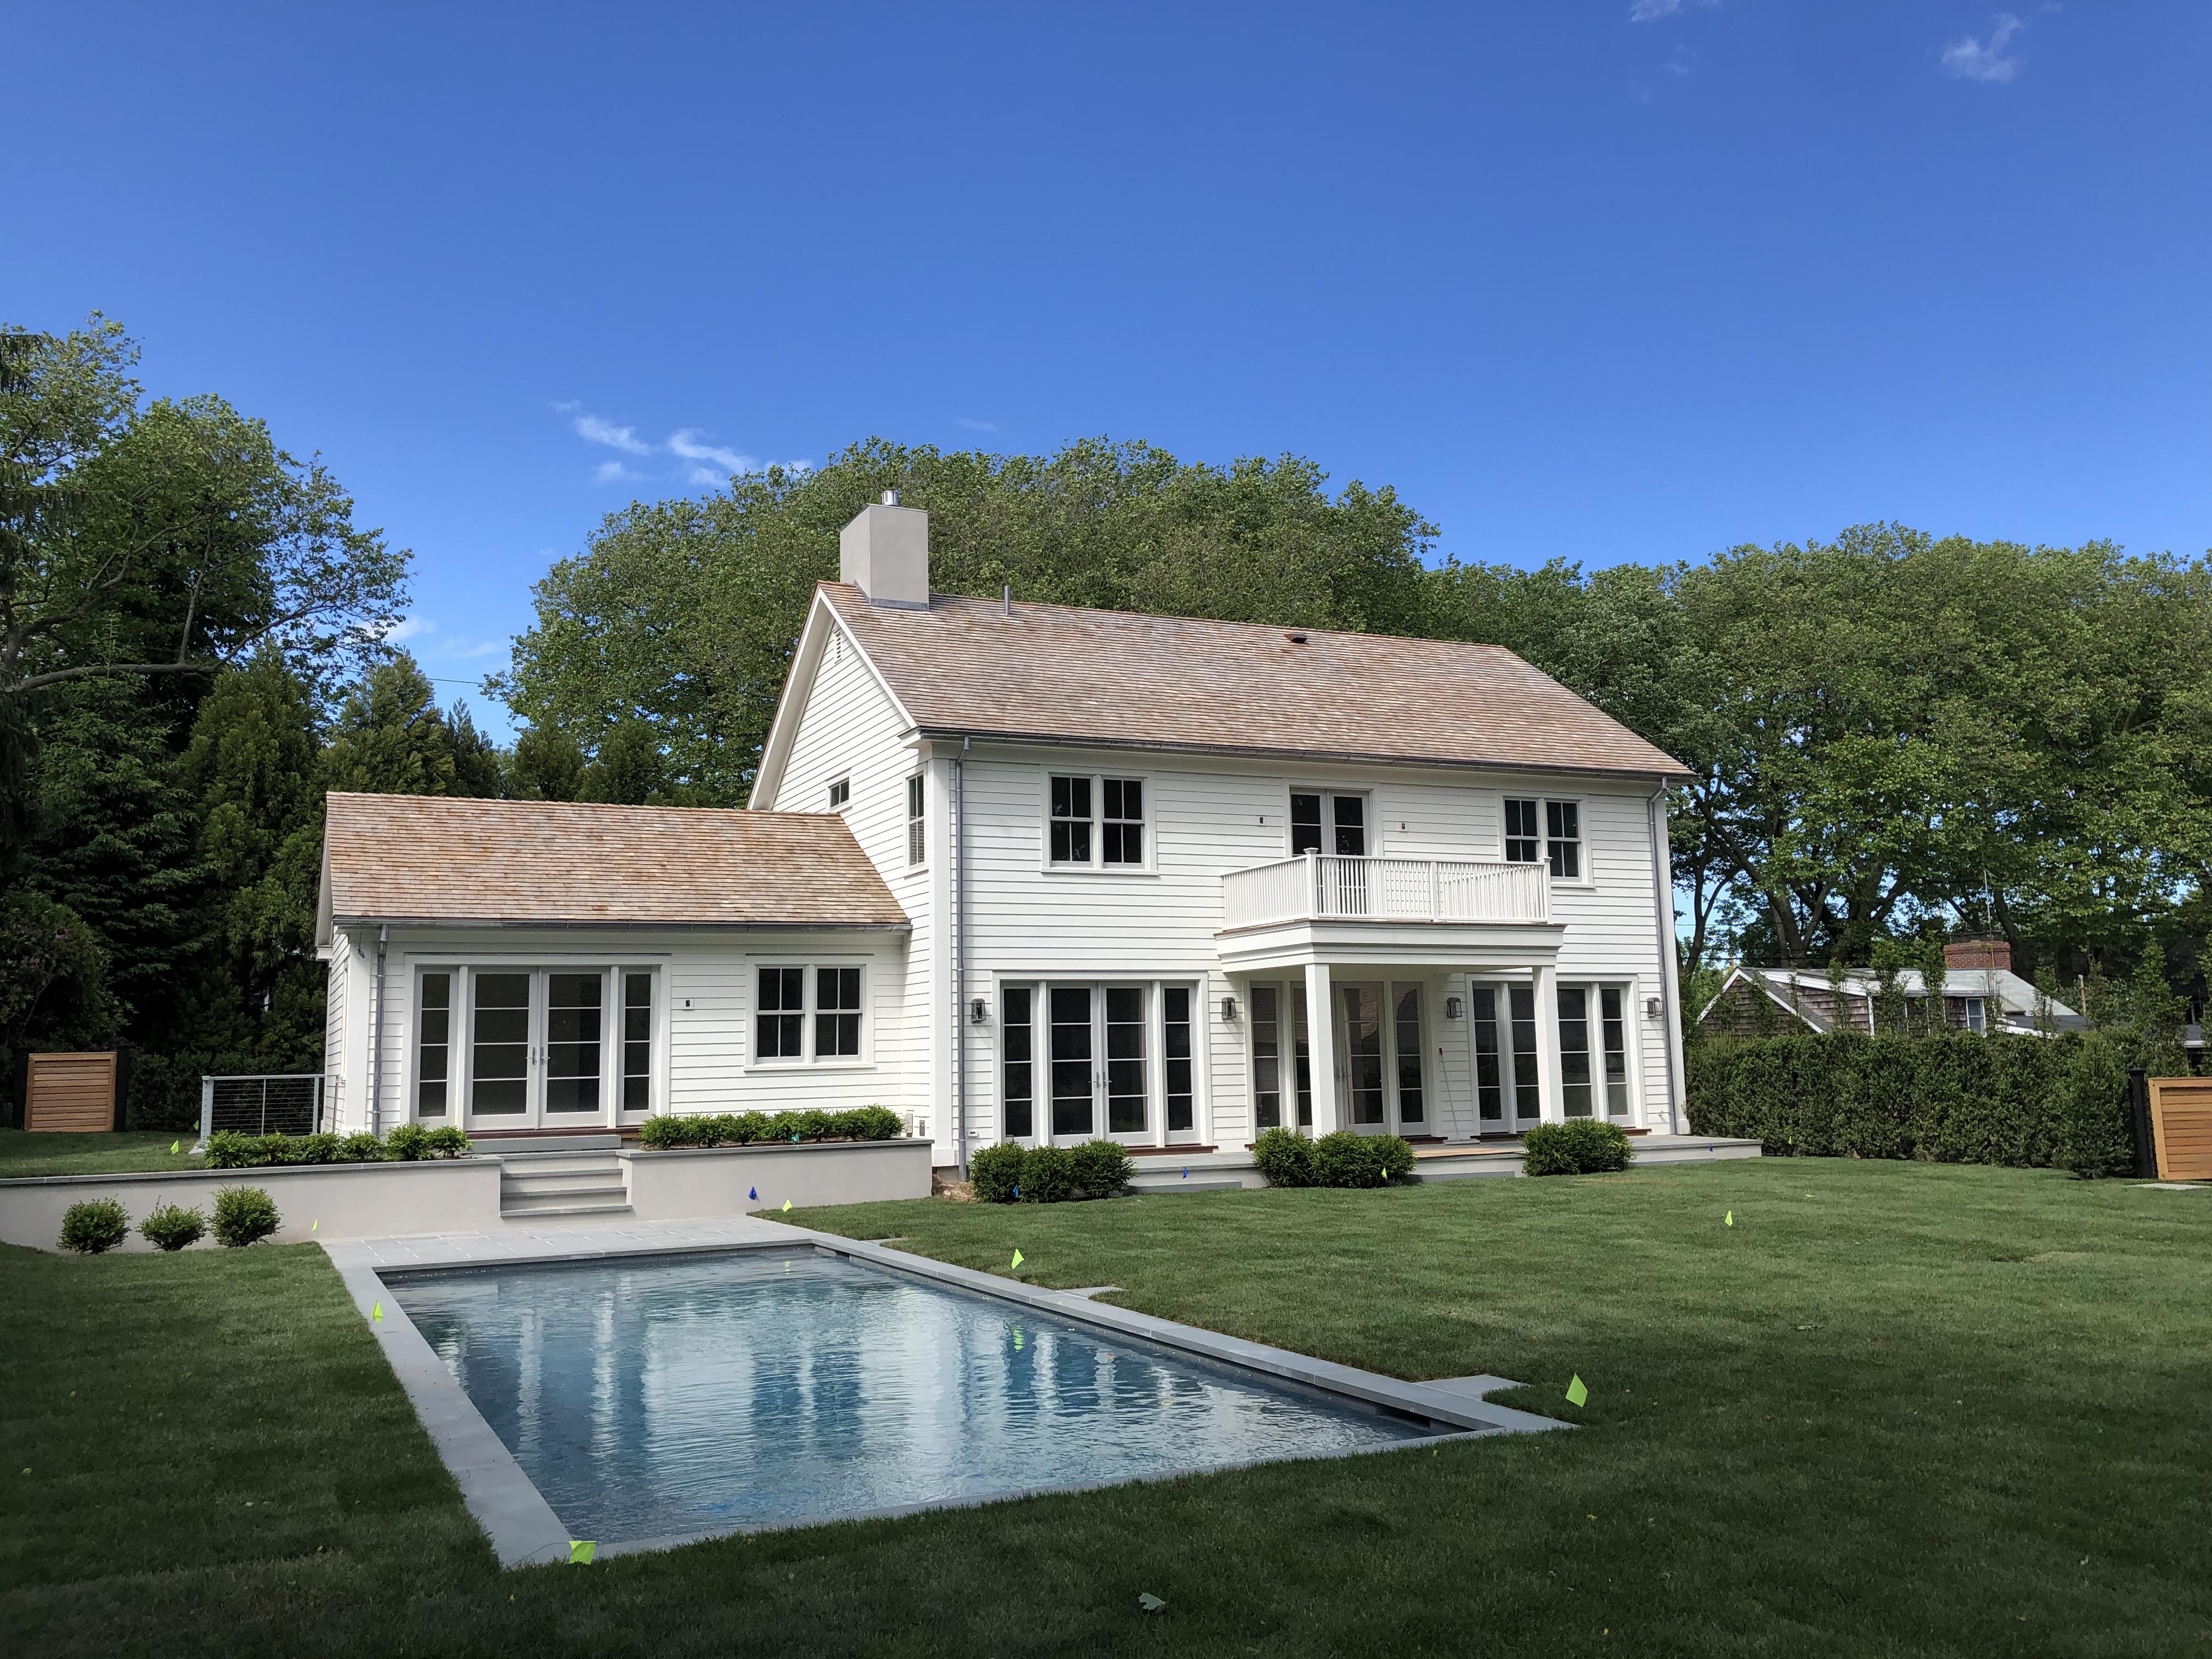 11 Talmage Ln - East Hampton Village, New York